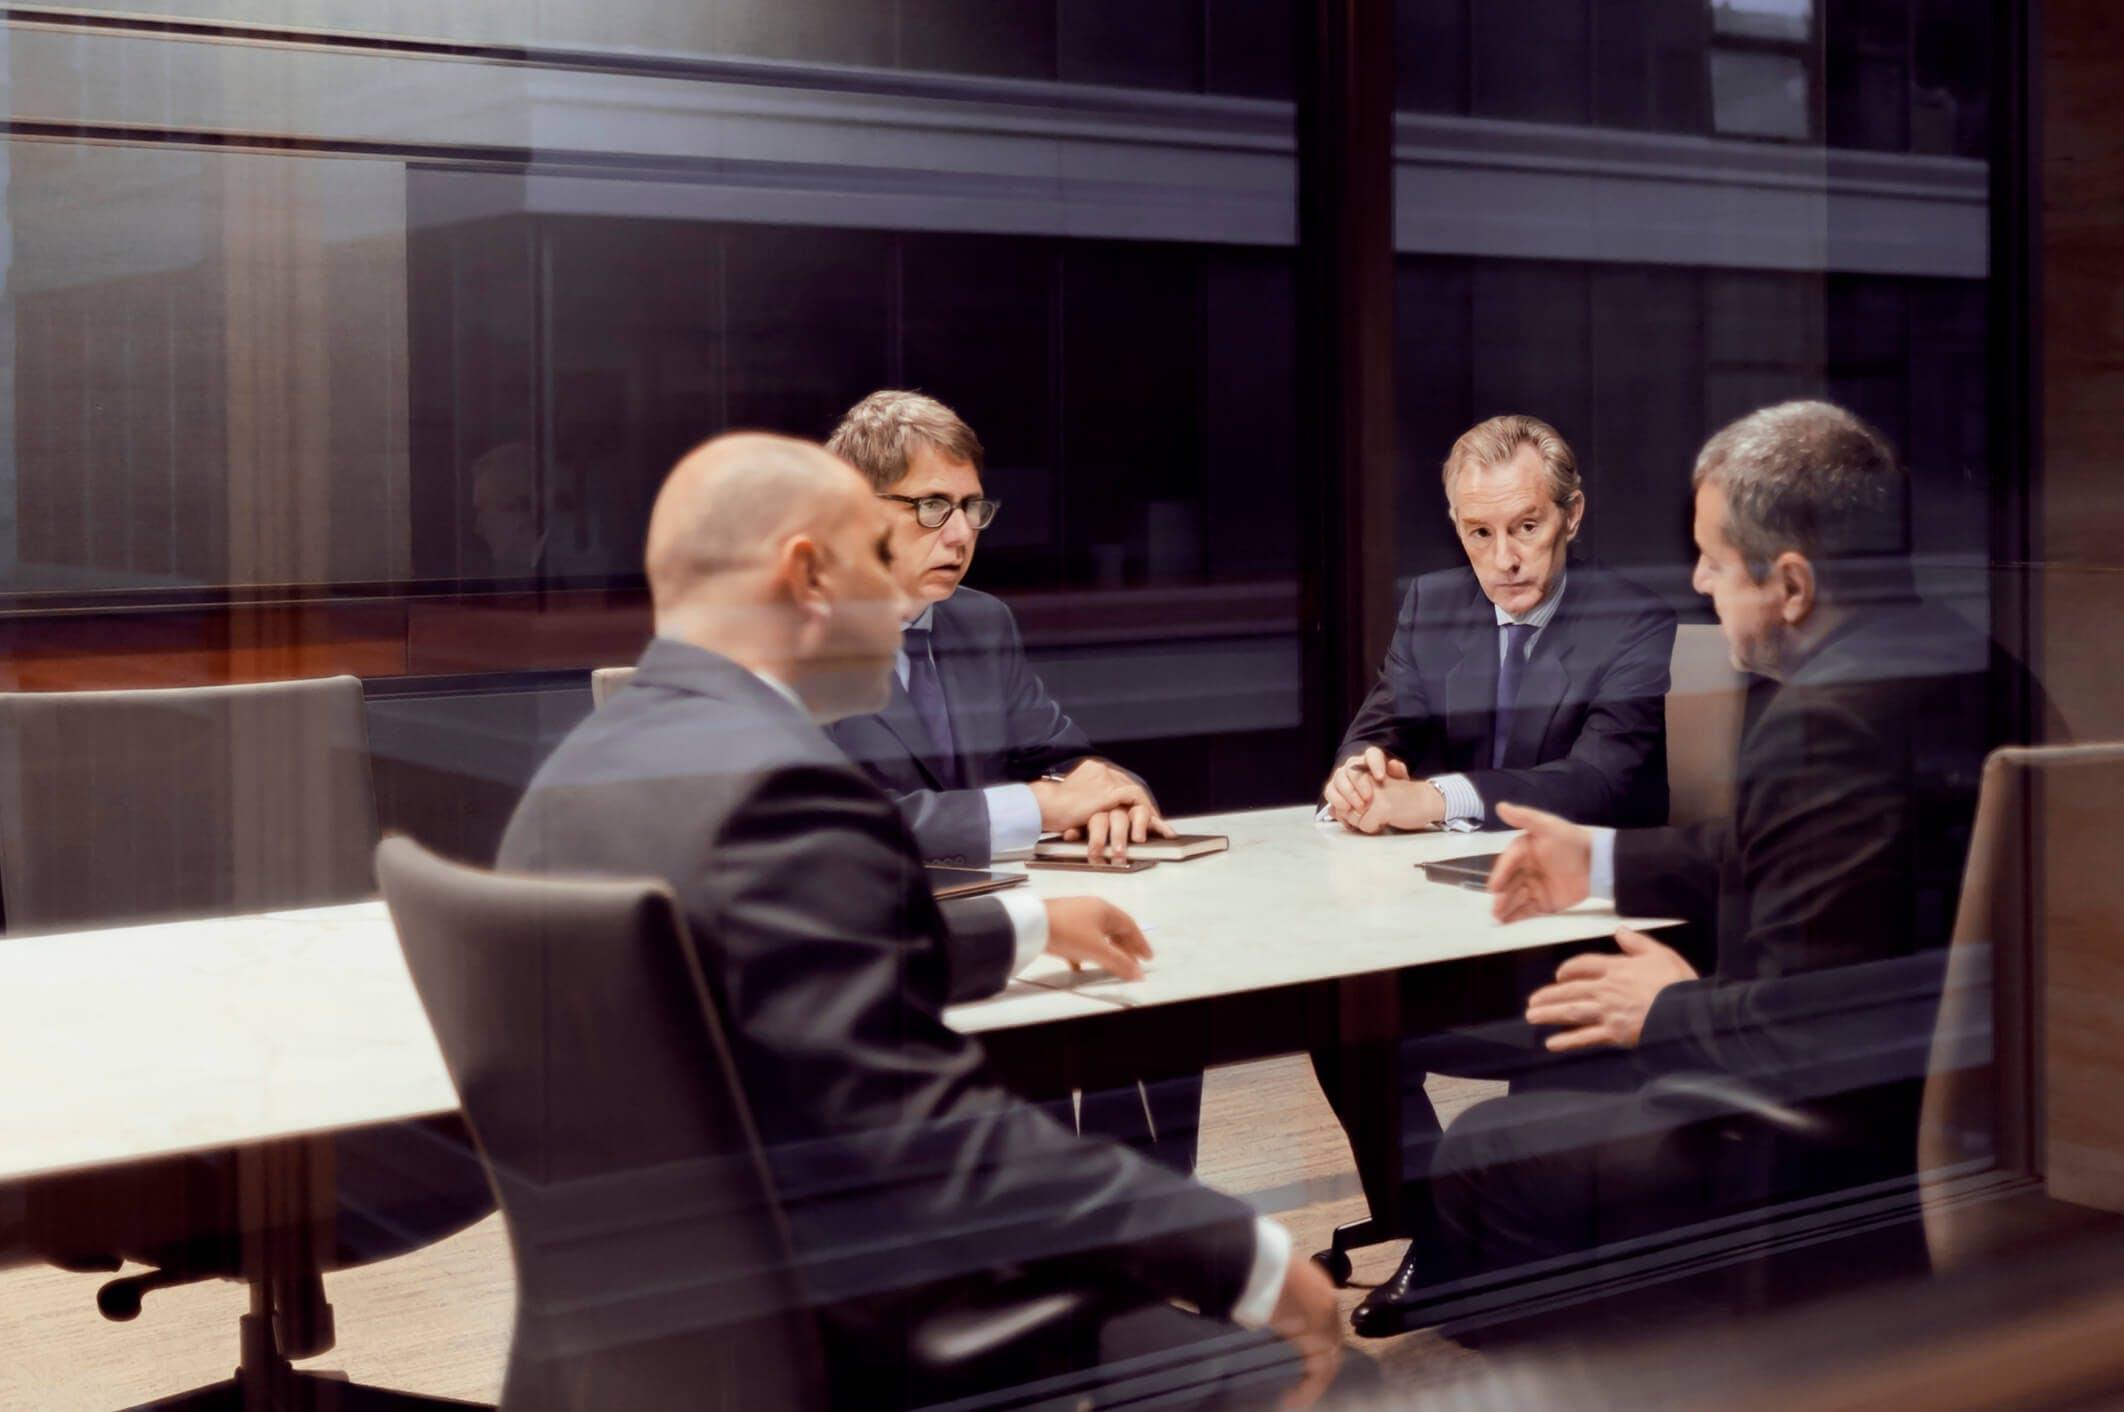 Titelbild-Verhandlung-Geschäftsleute-Meeting-iStock-637933212